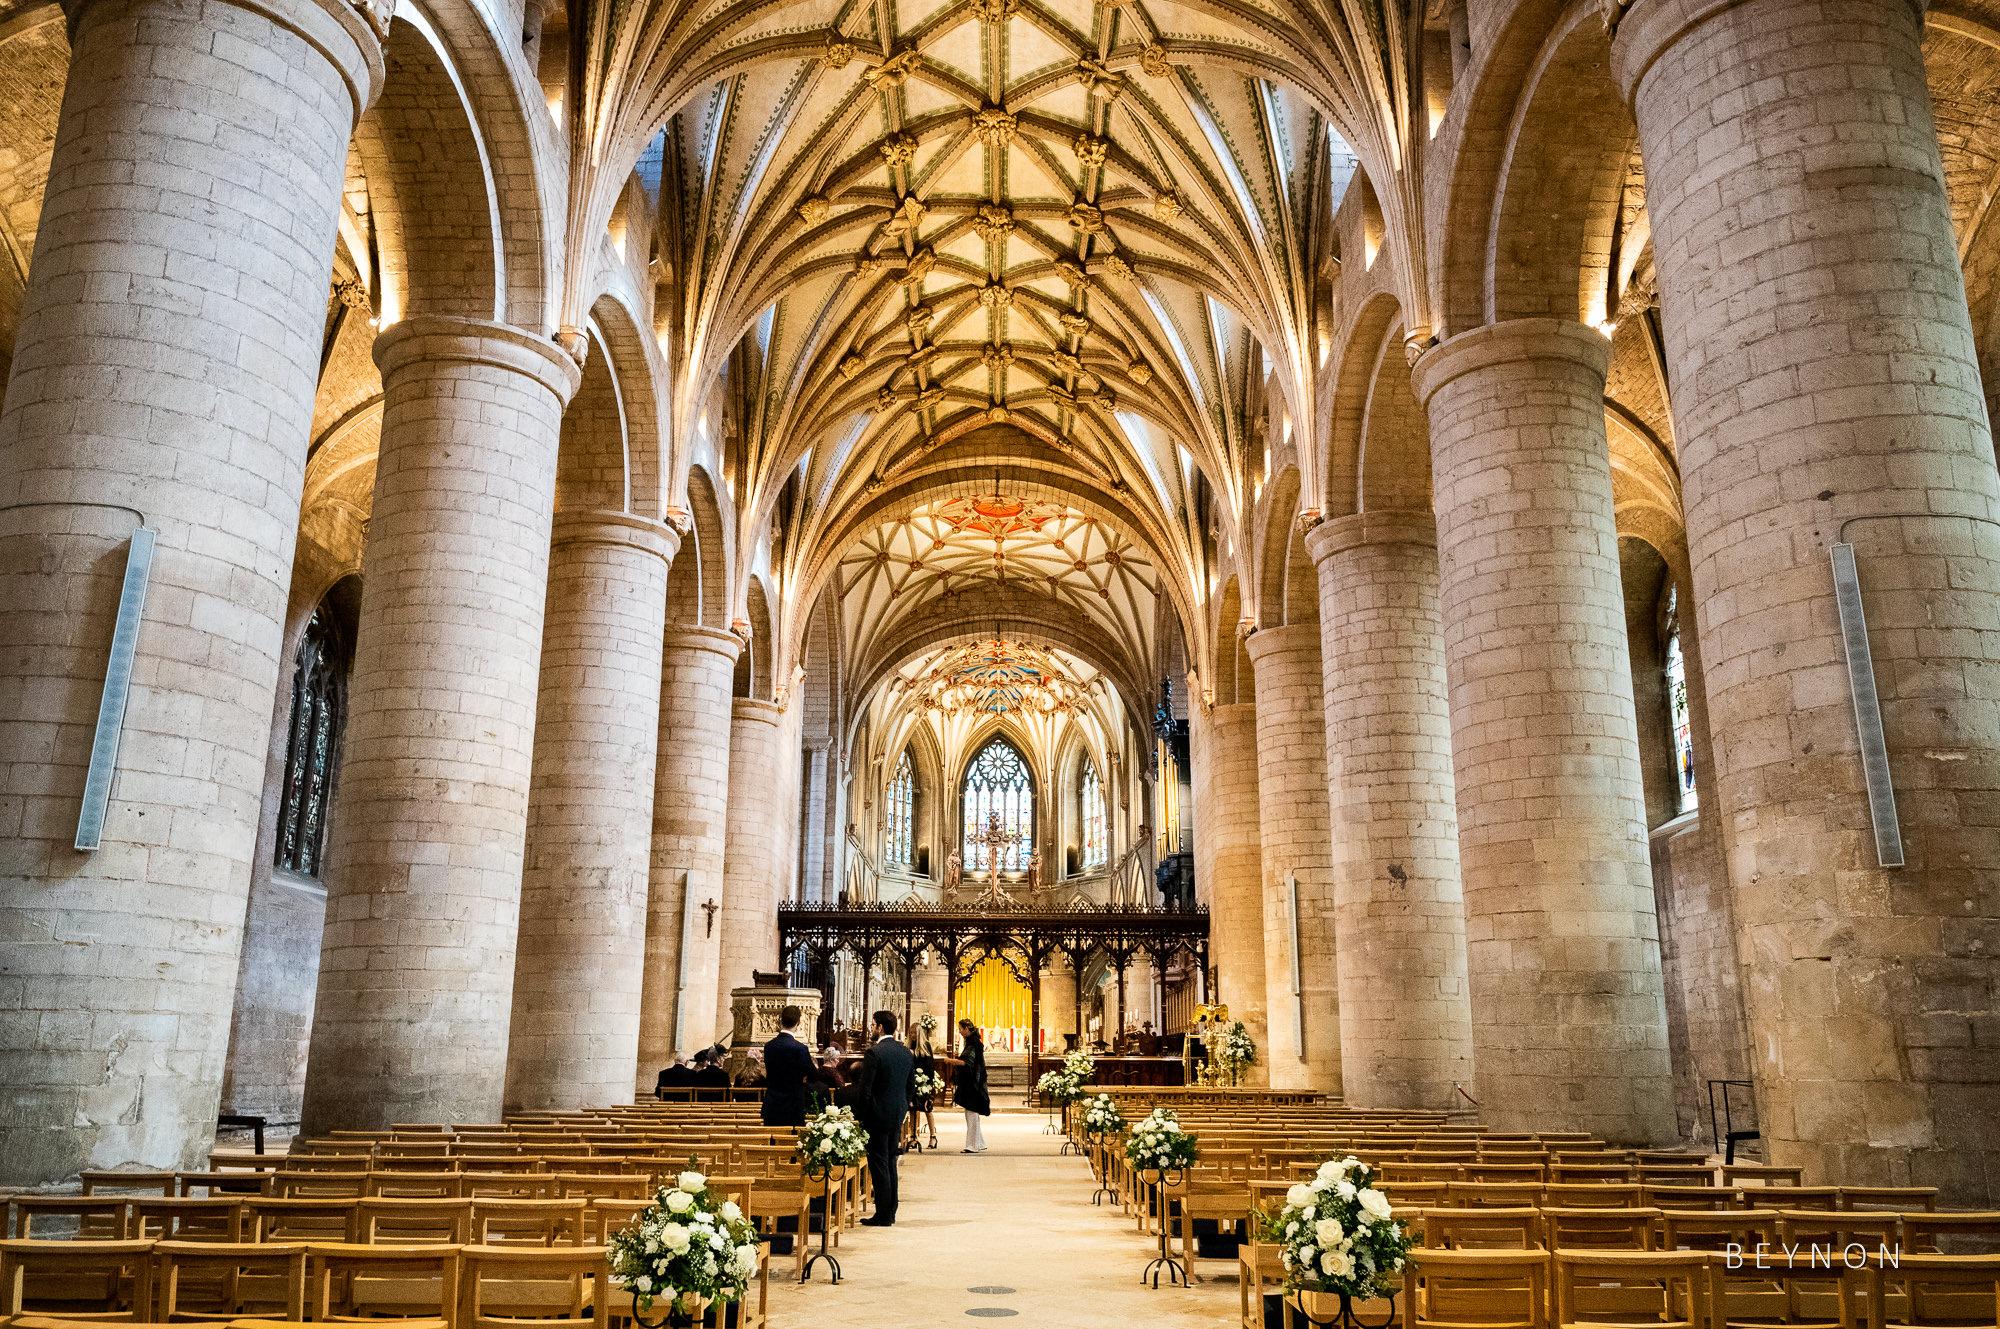 Inside Tewkesbury Abbey